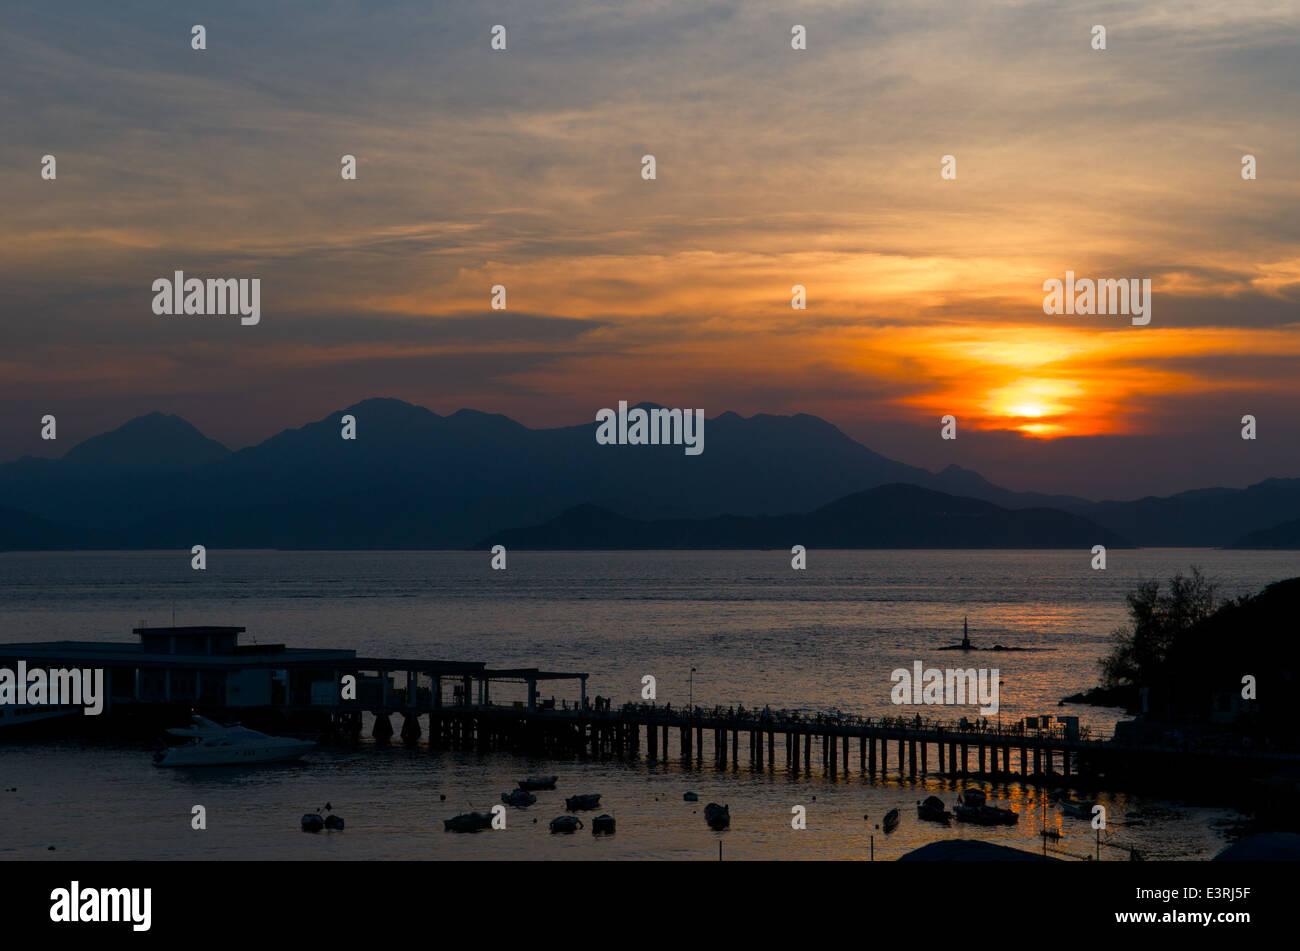 sunset over the Lamma Island ferry pier, Yung Shue Wan, Lamma Island, Hong Kong, China Stock Photo